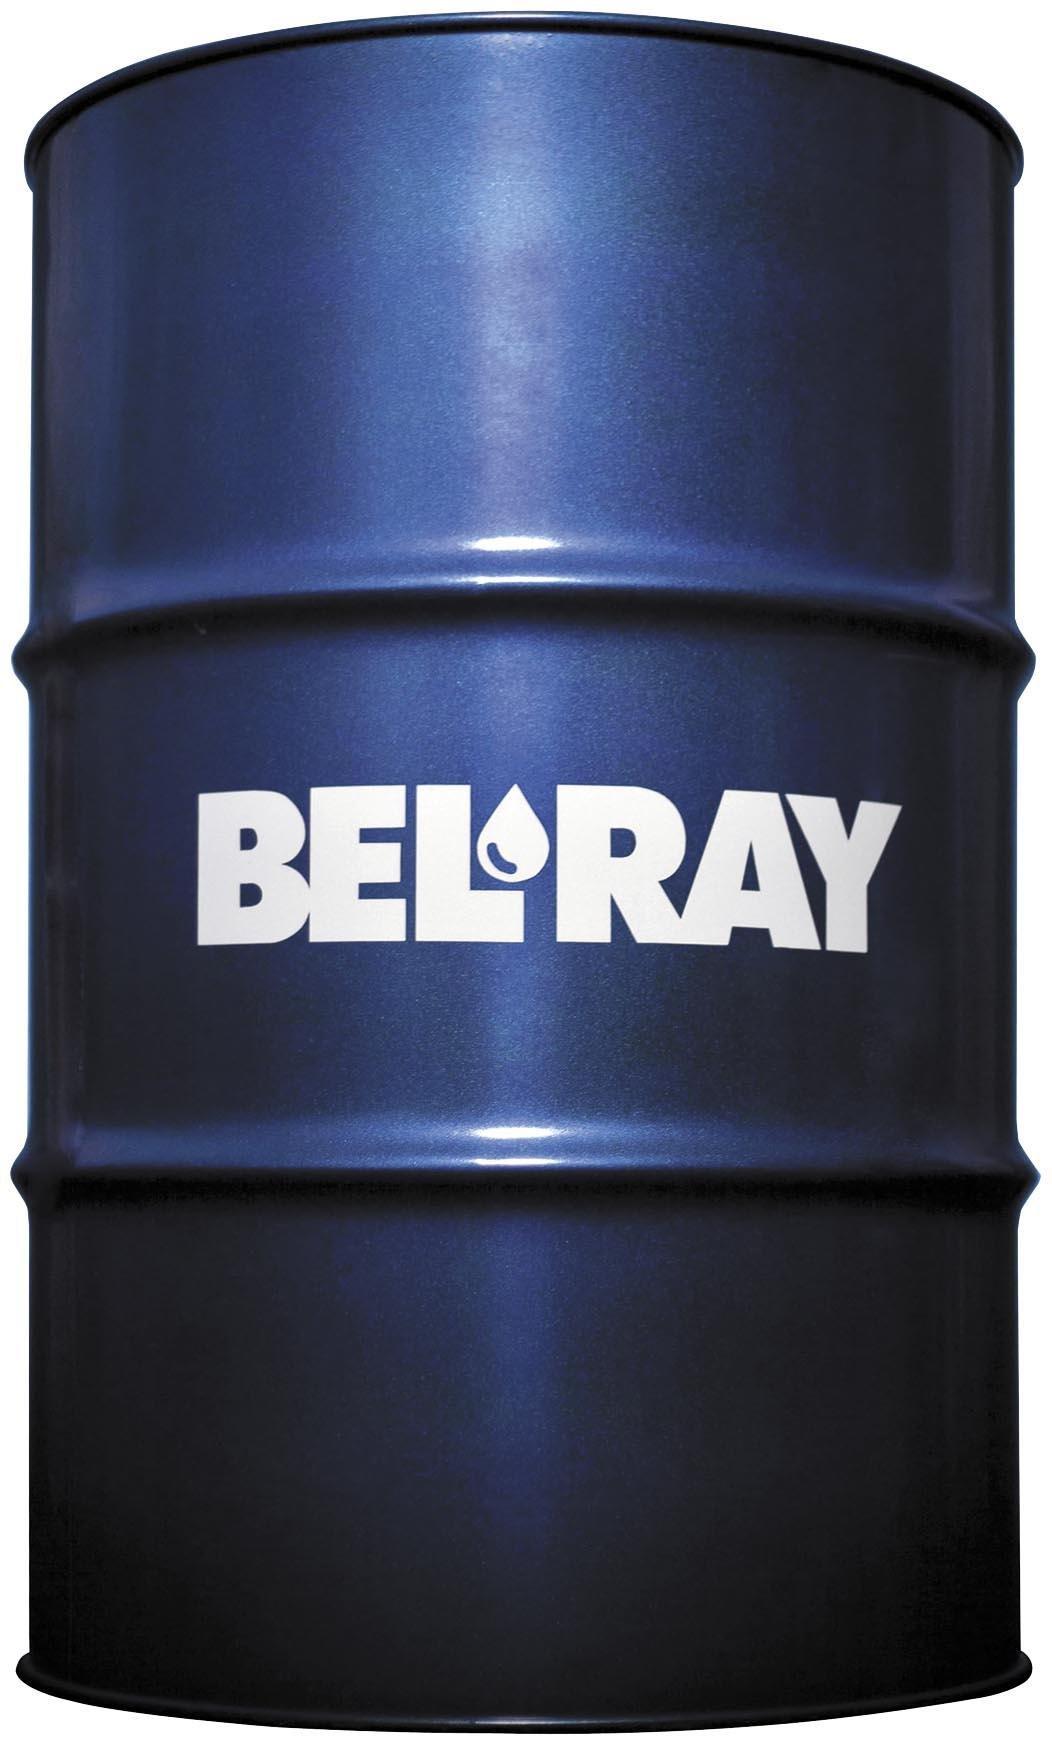 Bel-Ray Shop Oil 10W40 55 Gal. drum 99433-DTW